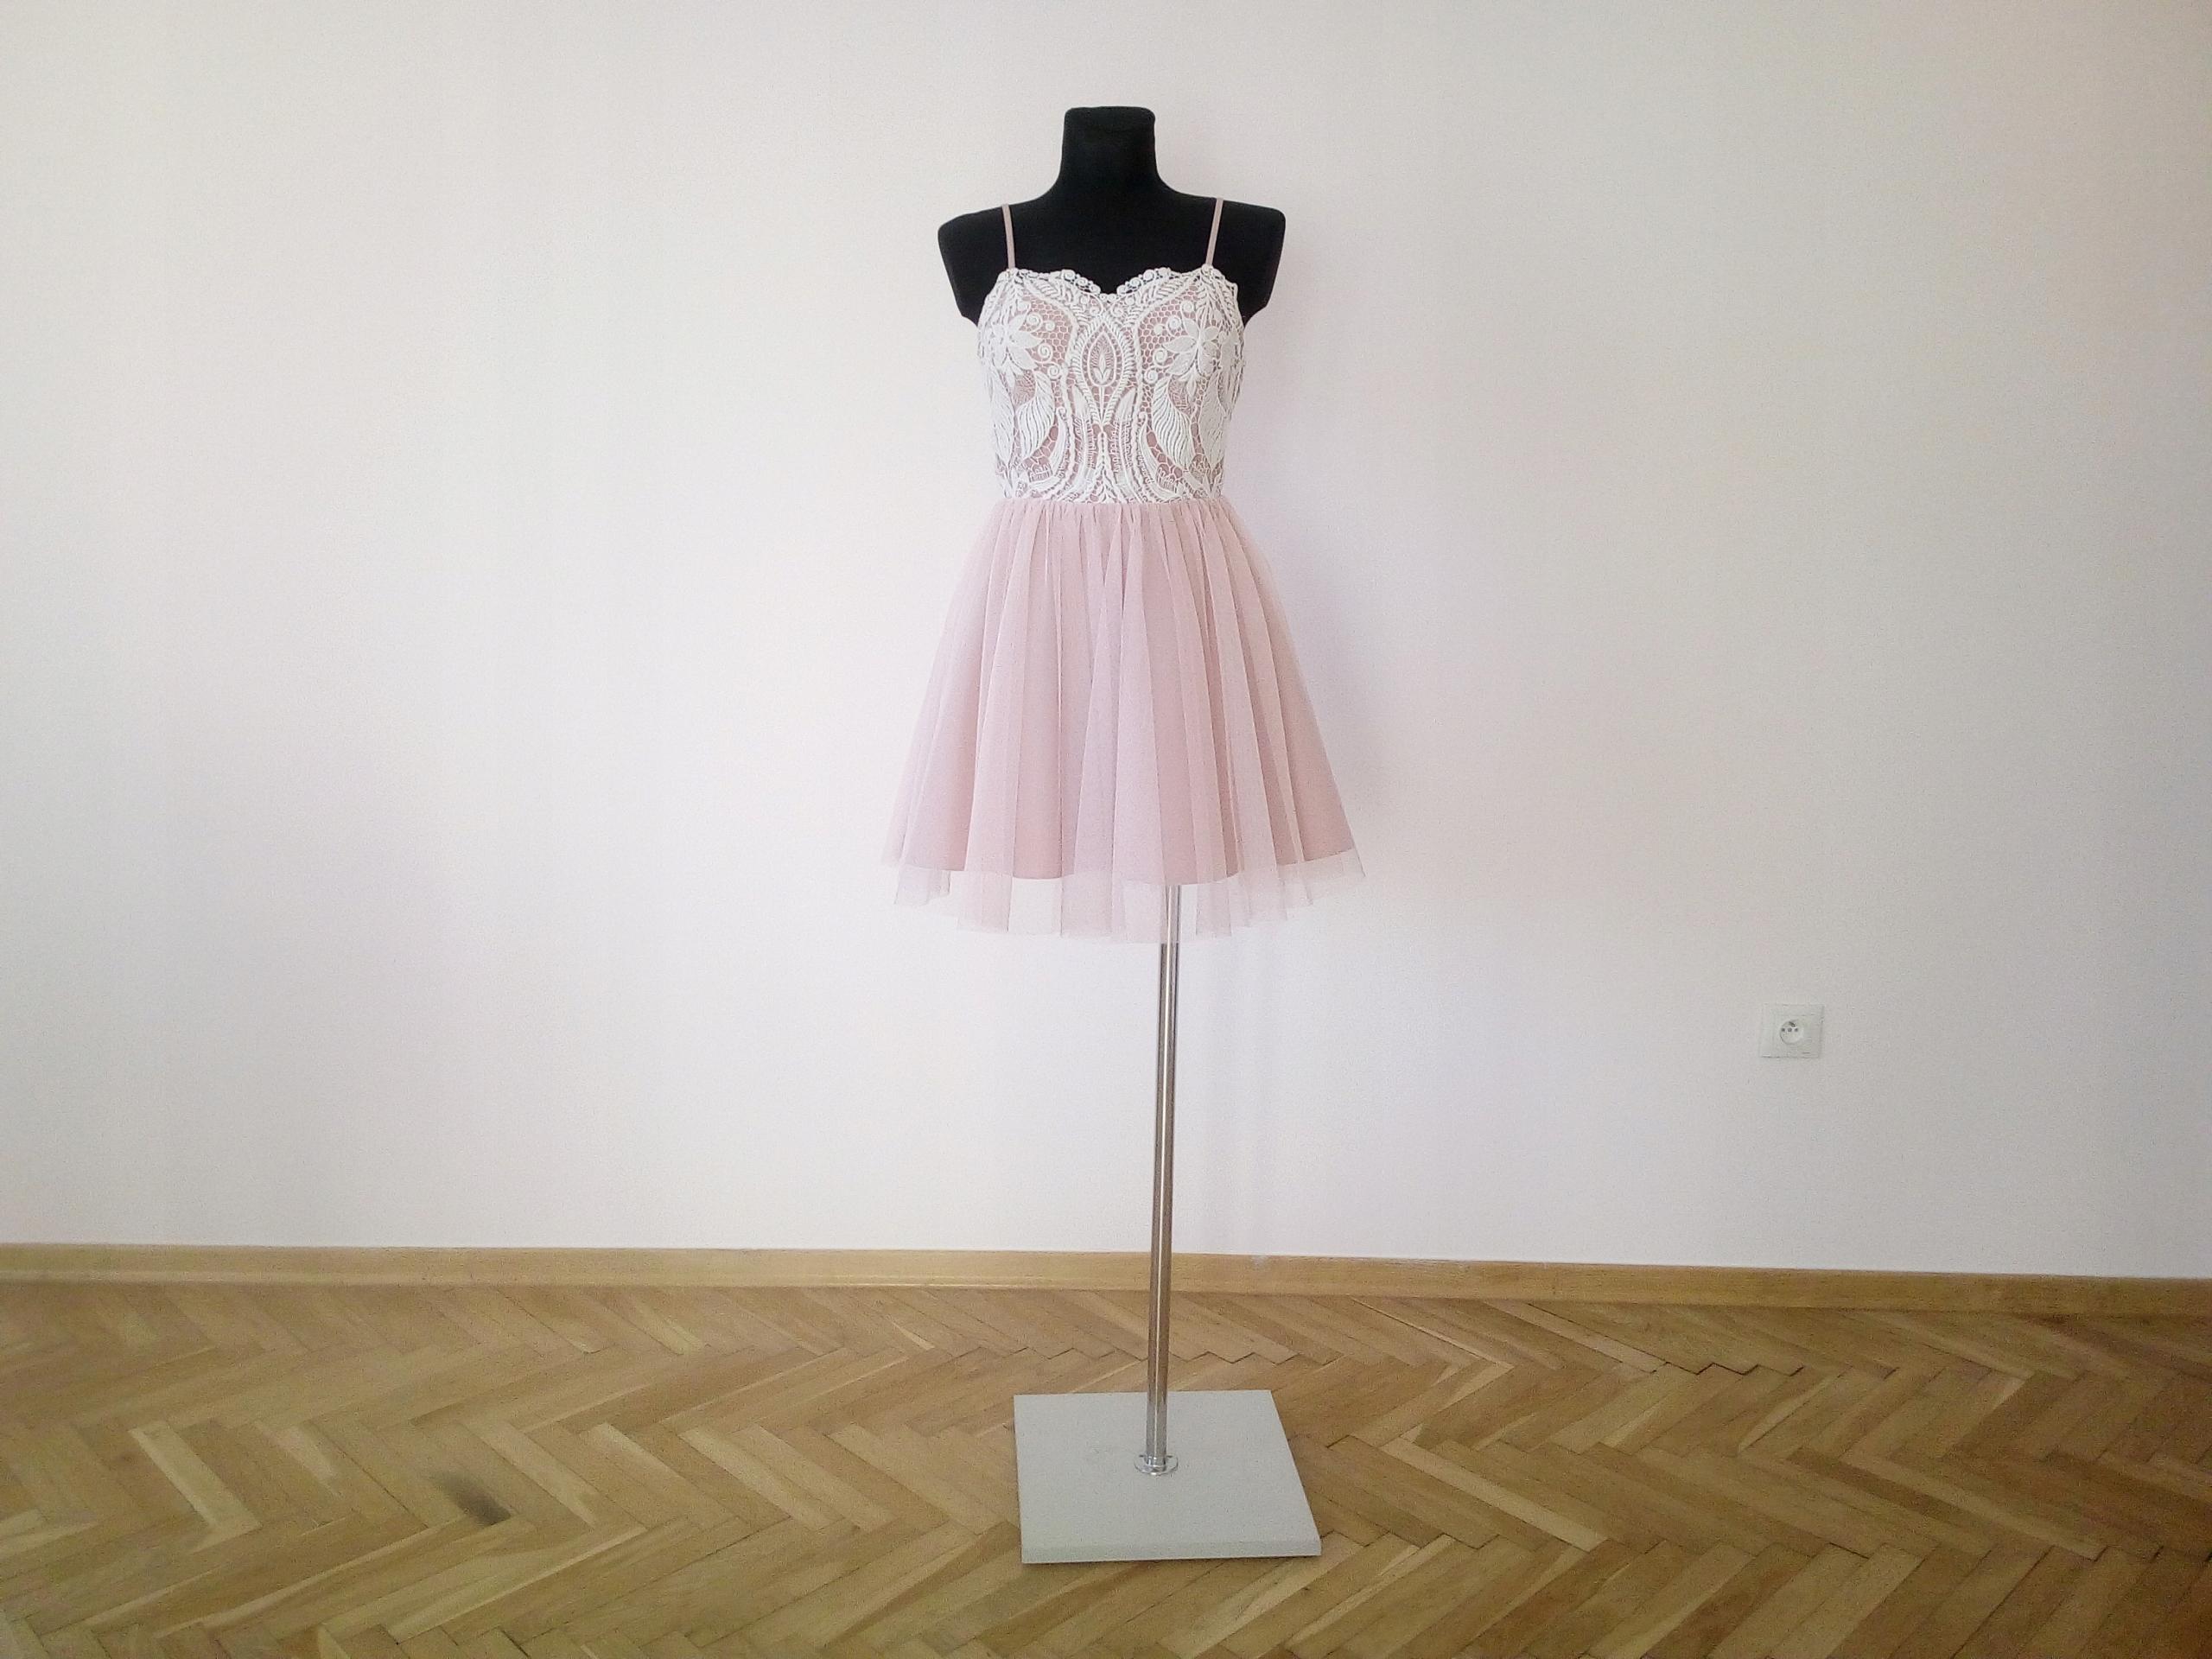 Sukienka damska wesele Sylwestra 38 M Róż J.NOWA